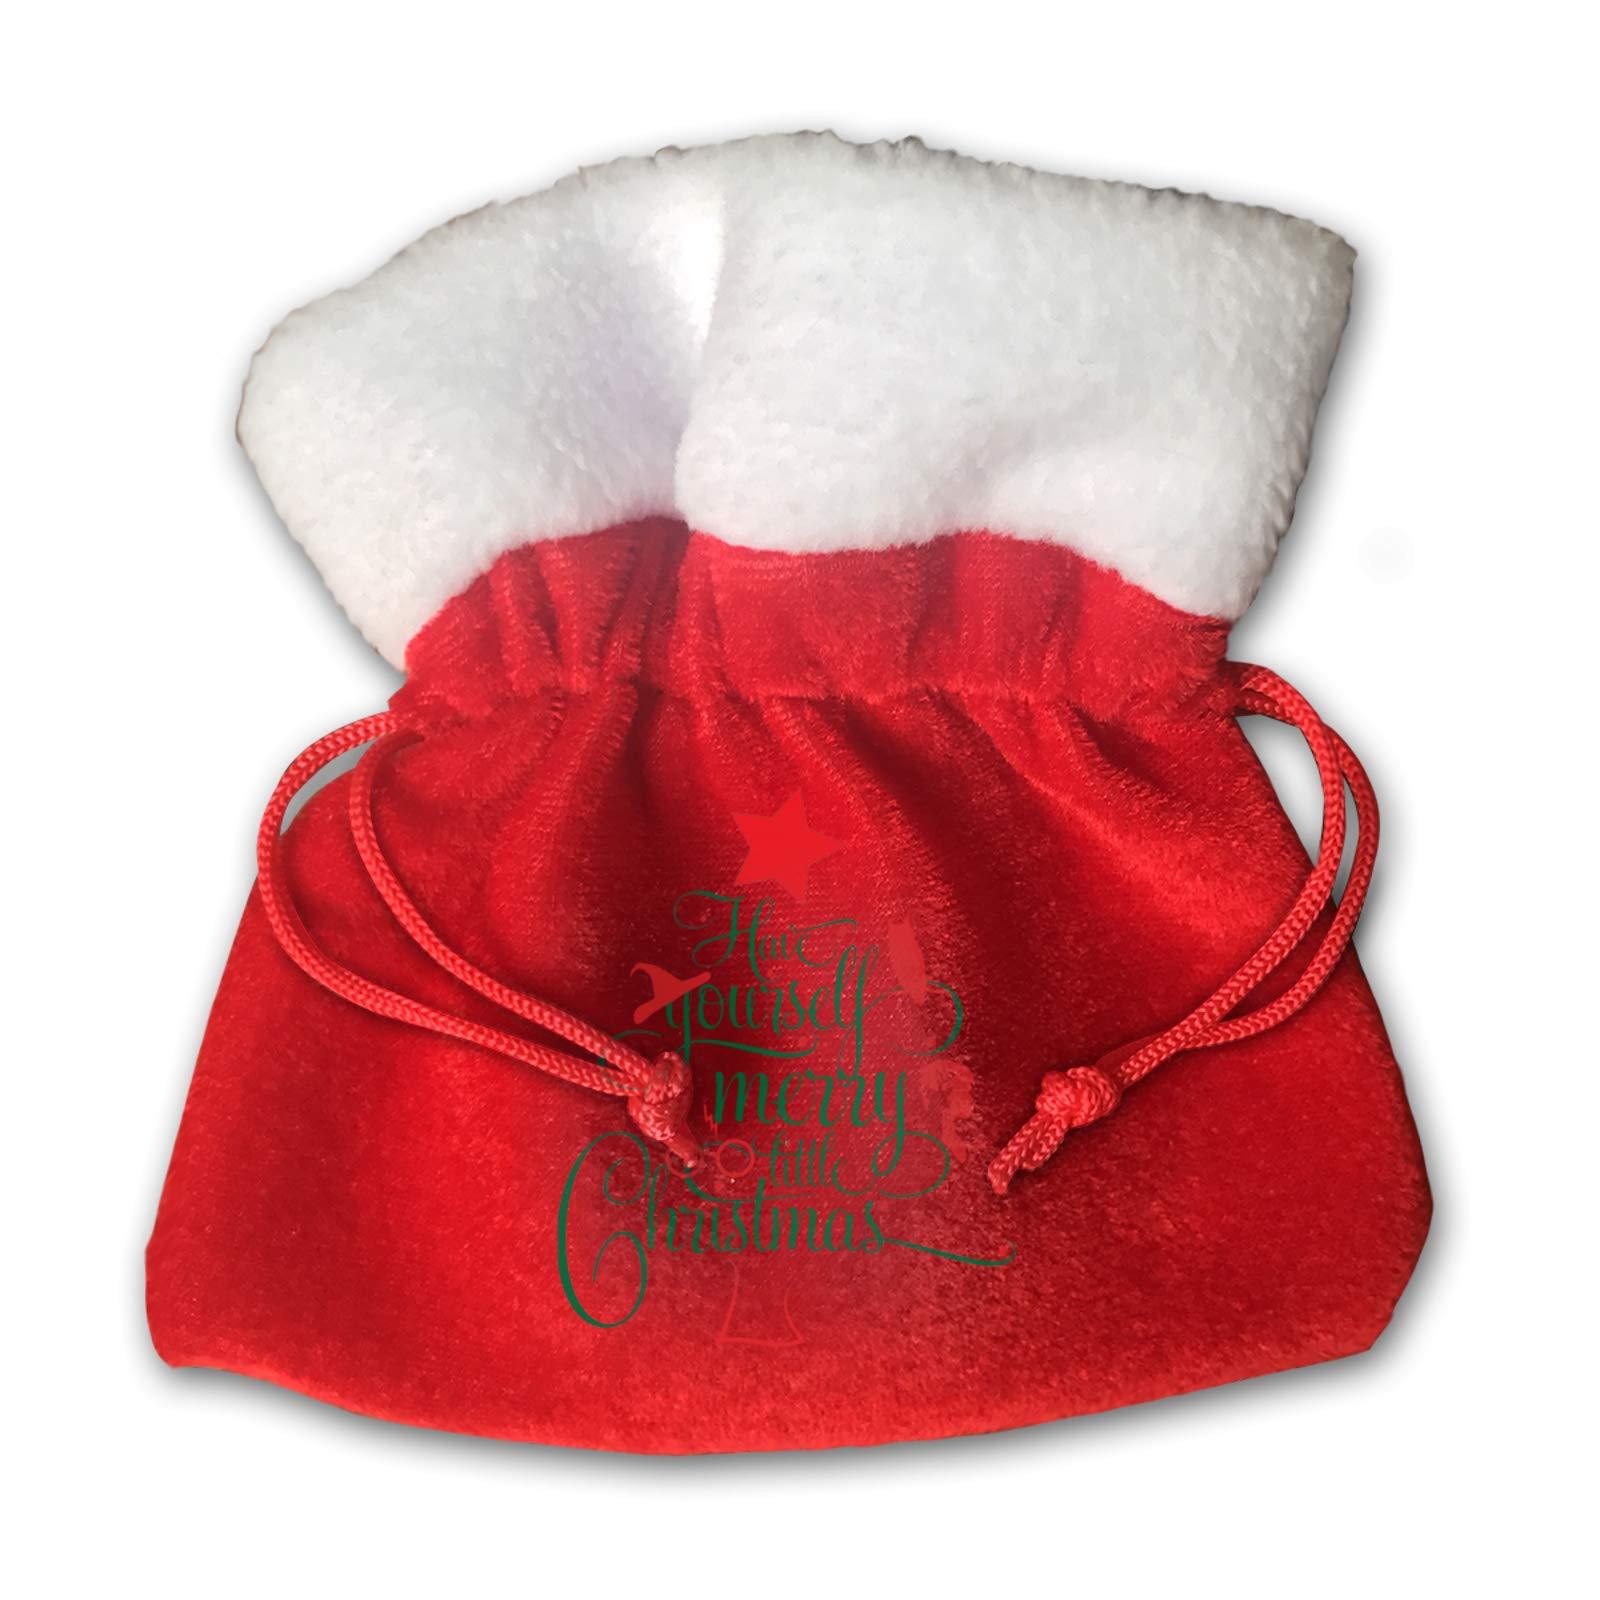 Thomasa Harry-Potter Christmas Christmas Bag Santa Sack with Drawstring Red Gift Bag Backpack for Christmas Party Supplies Small